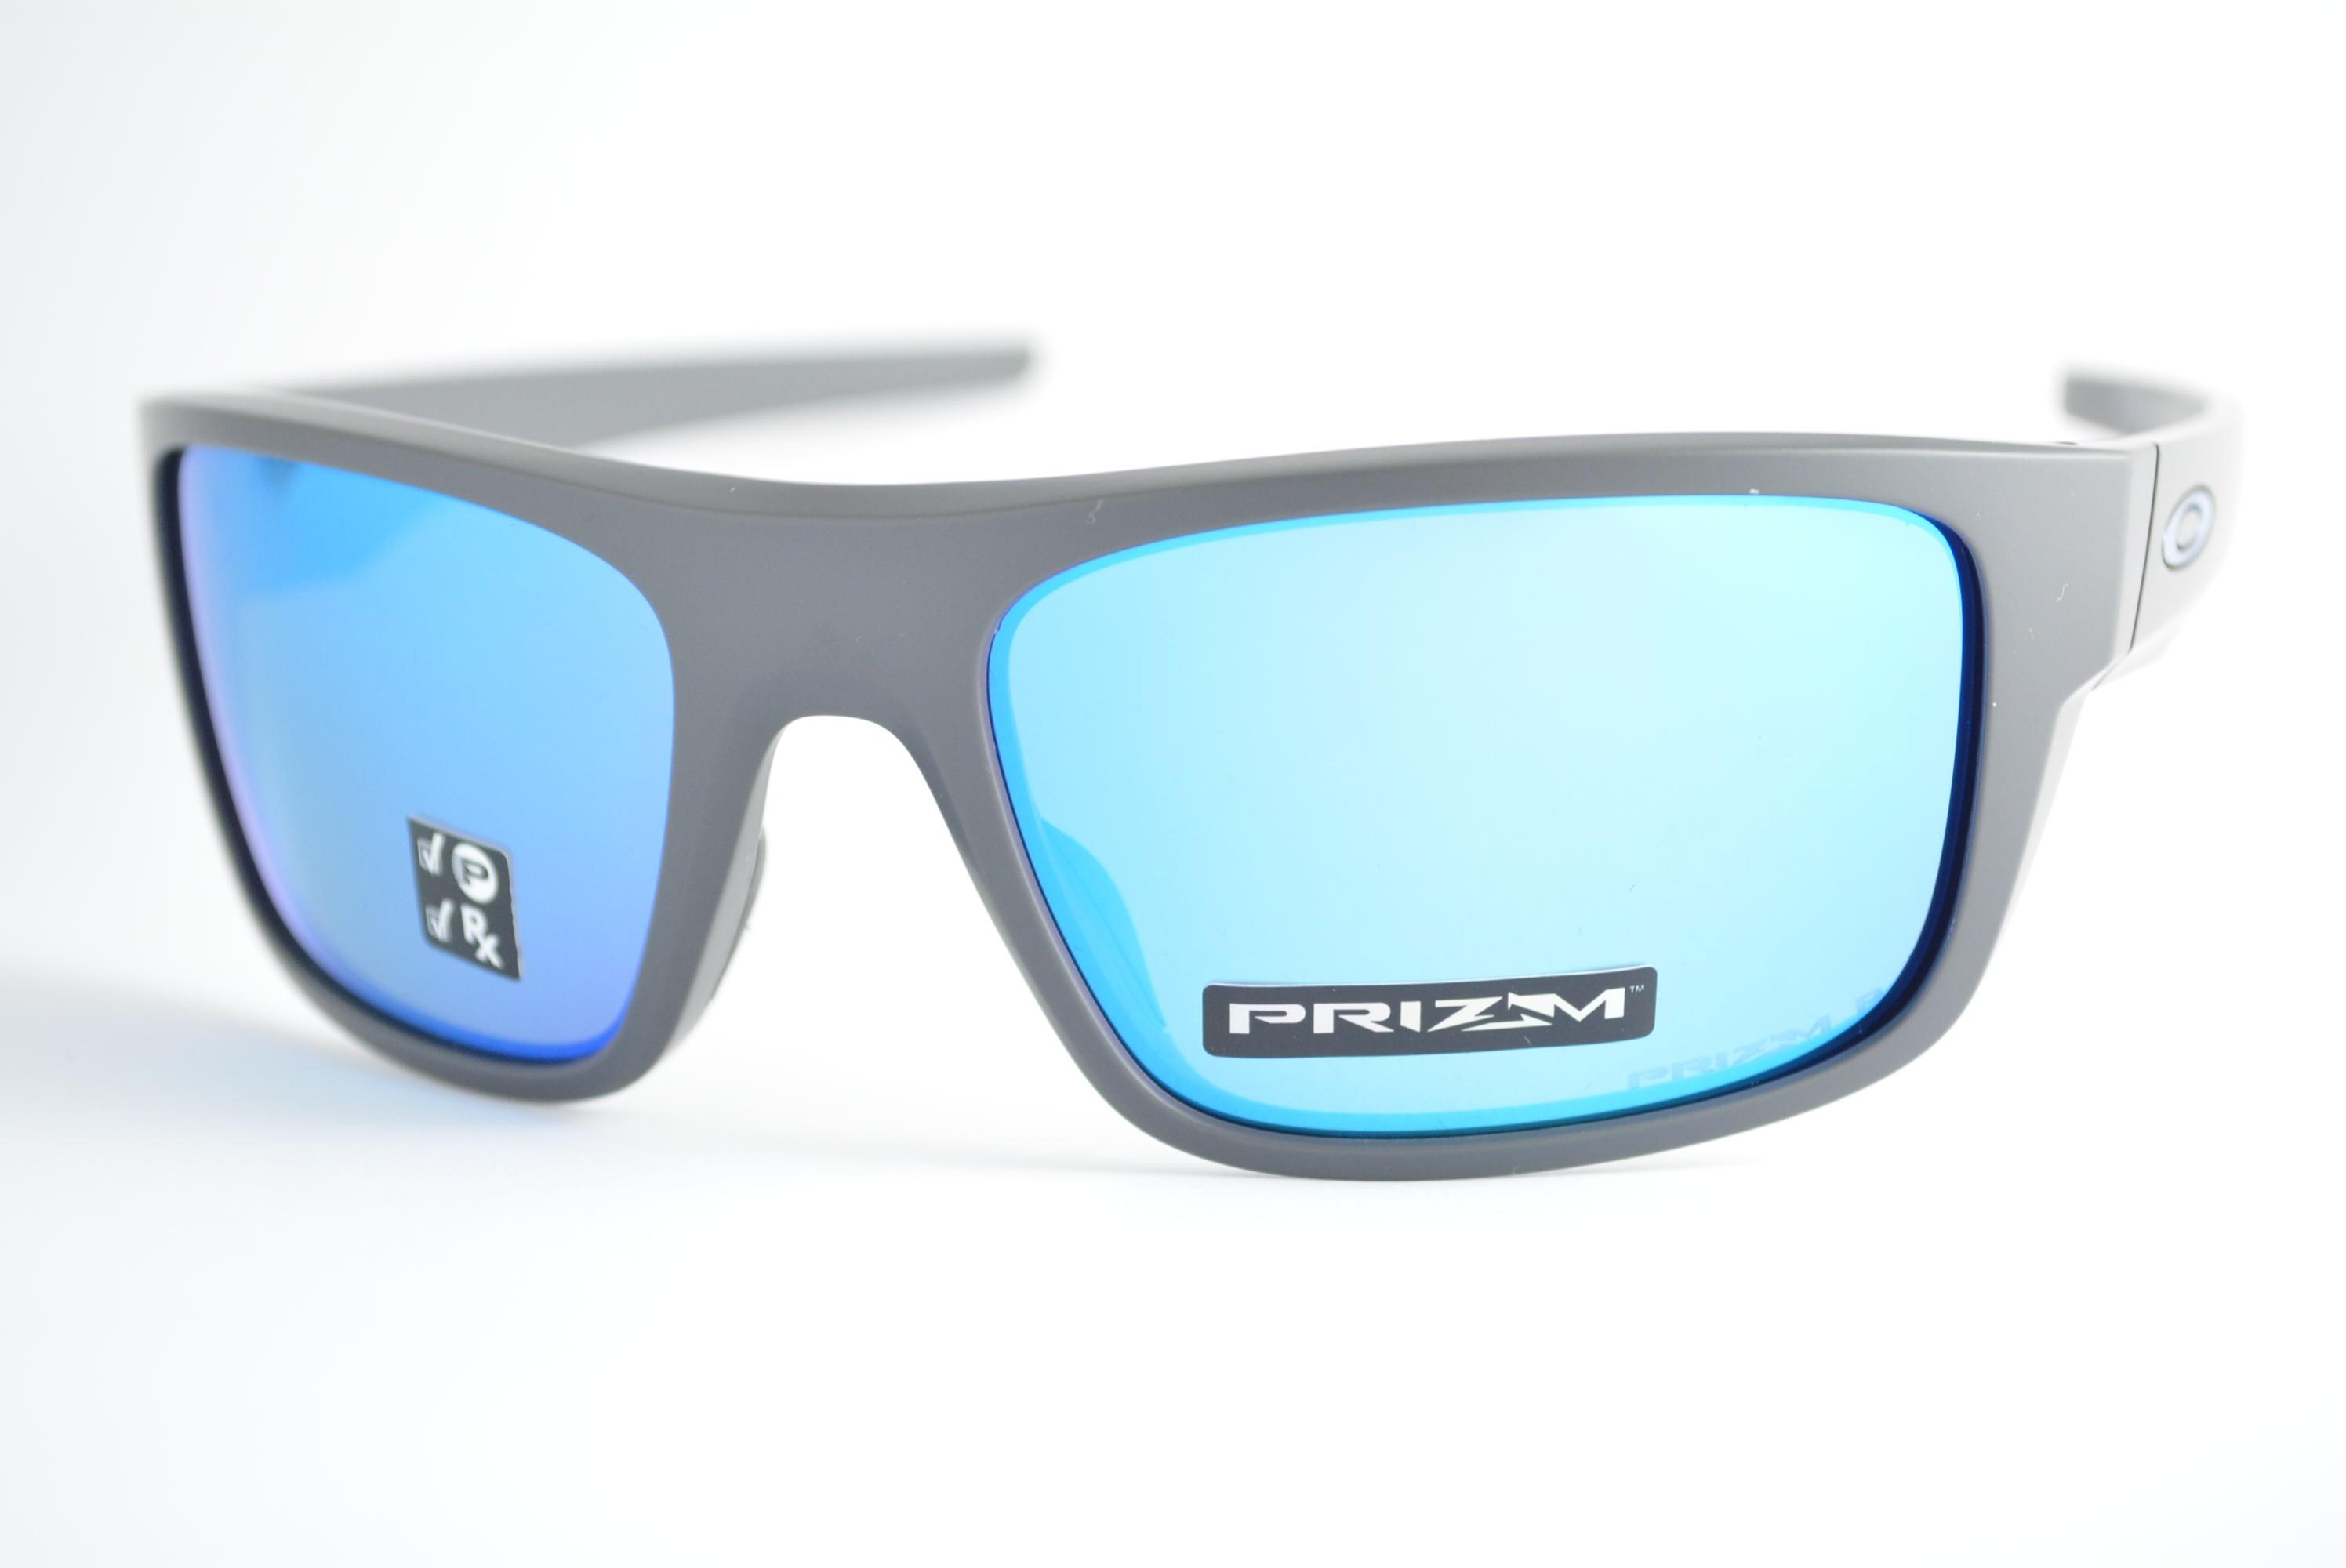 óculos de sol Oakley mod Drop Point matte dark grey w prizm sapphire  polarized 9367 7e8d2c316a